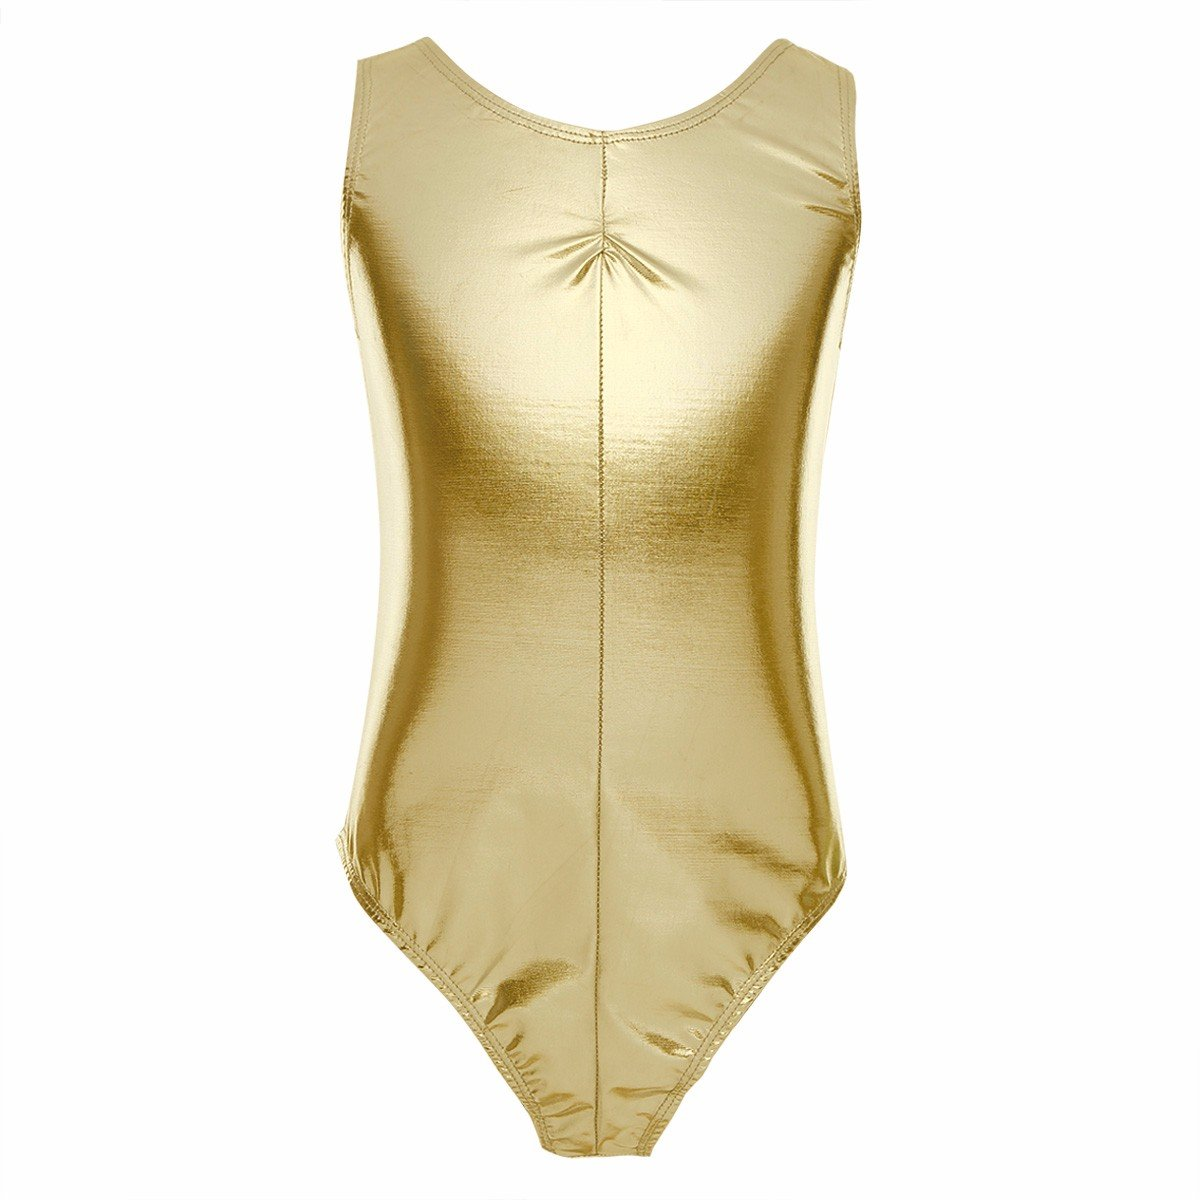 4328e893e Amazon.com  iEFiEL Girls  Kids Basic Ballet Gymnastics Costumes ...